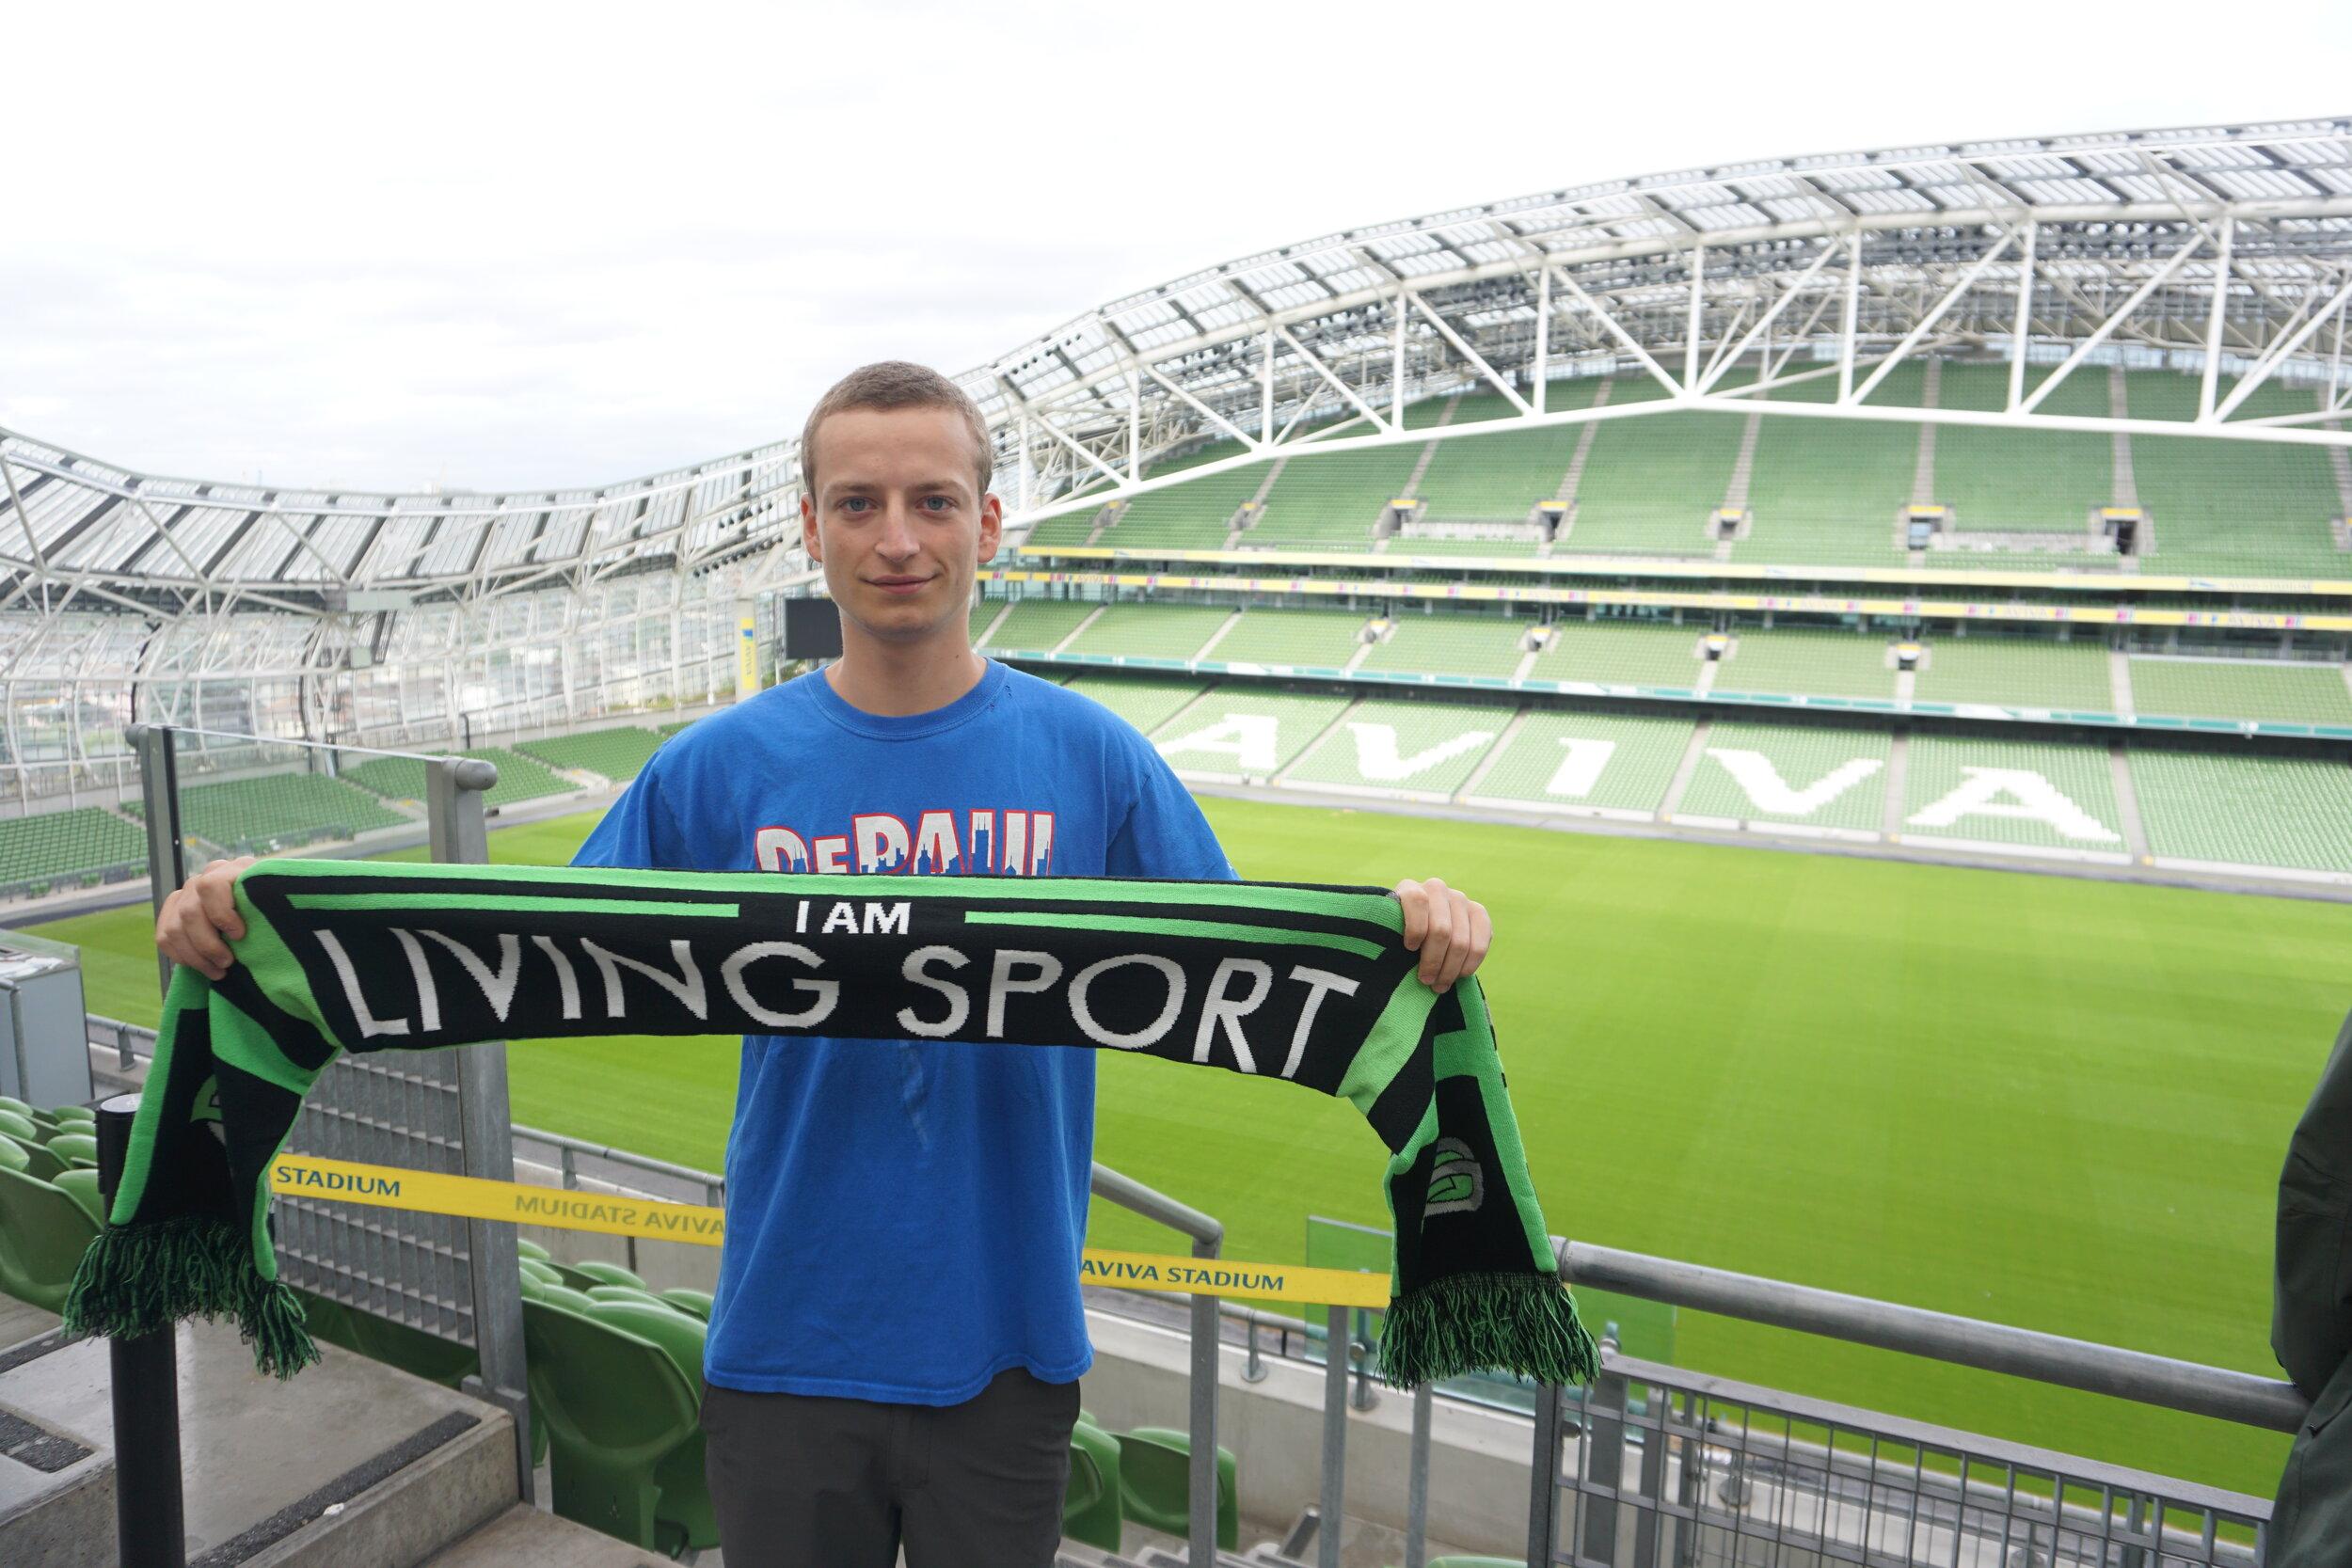 Sean visiting Aviva Stadium in Dublin, Ireland as part of the International Sport Business Program in 2019